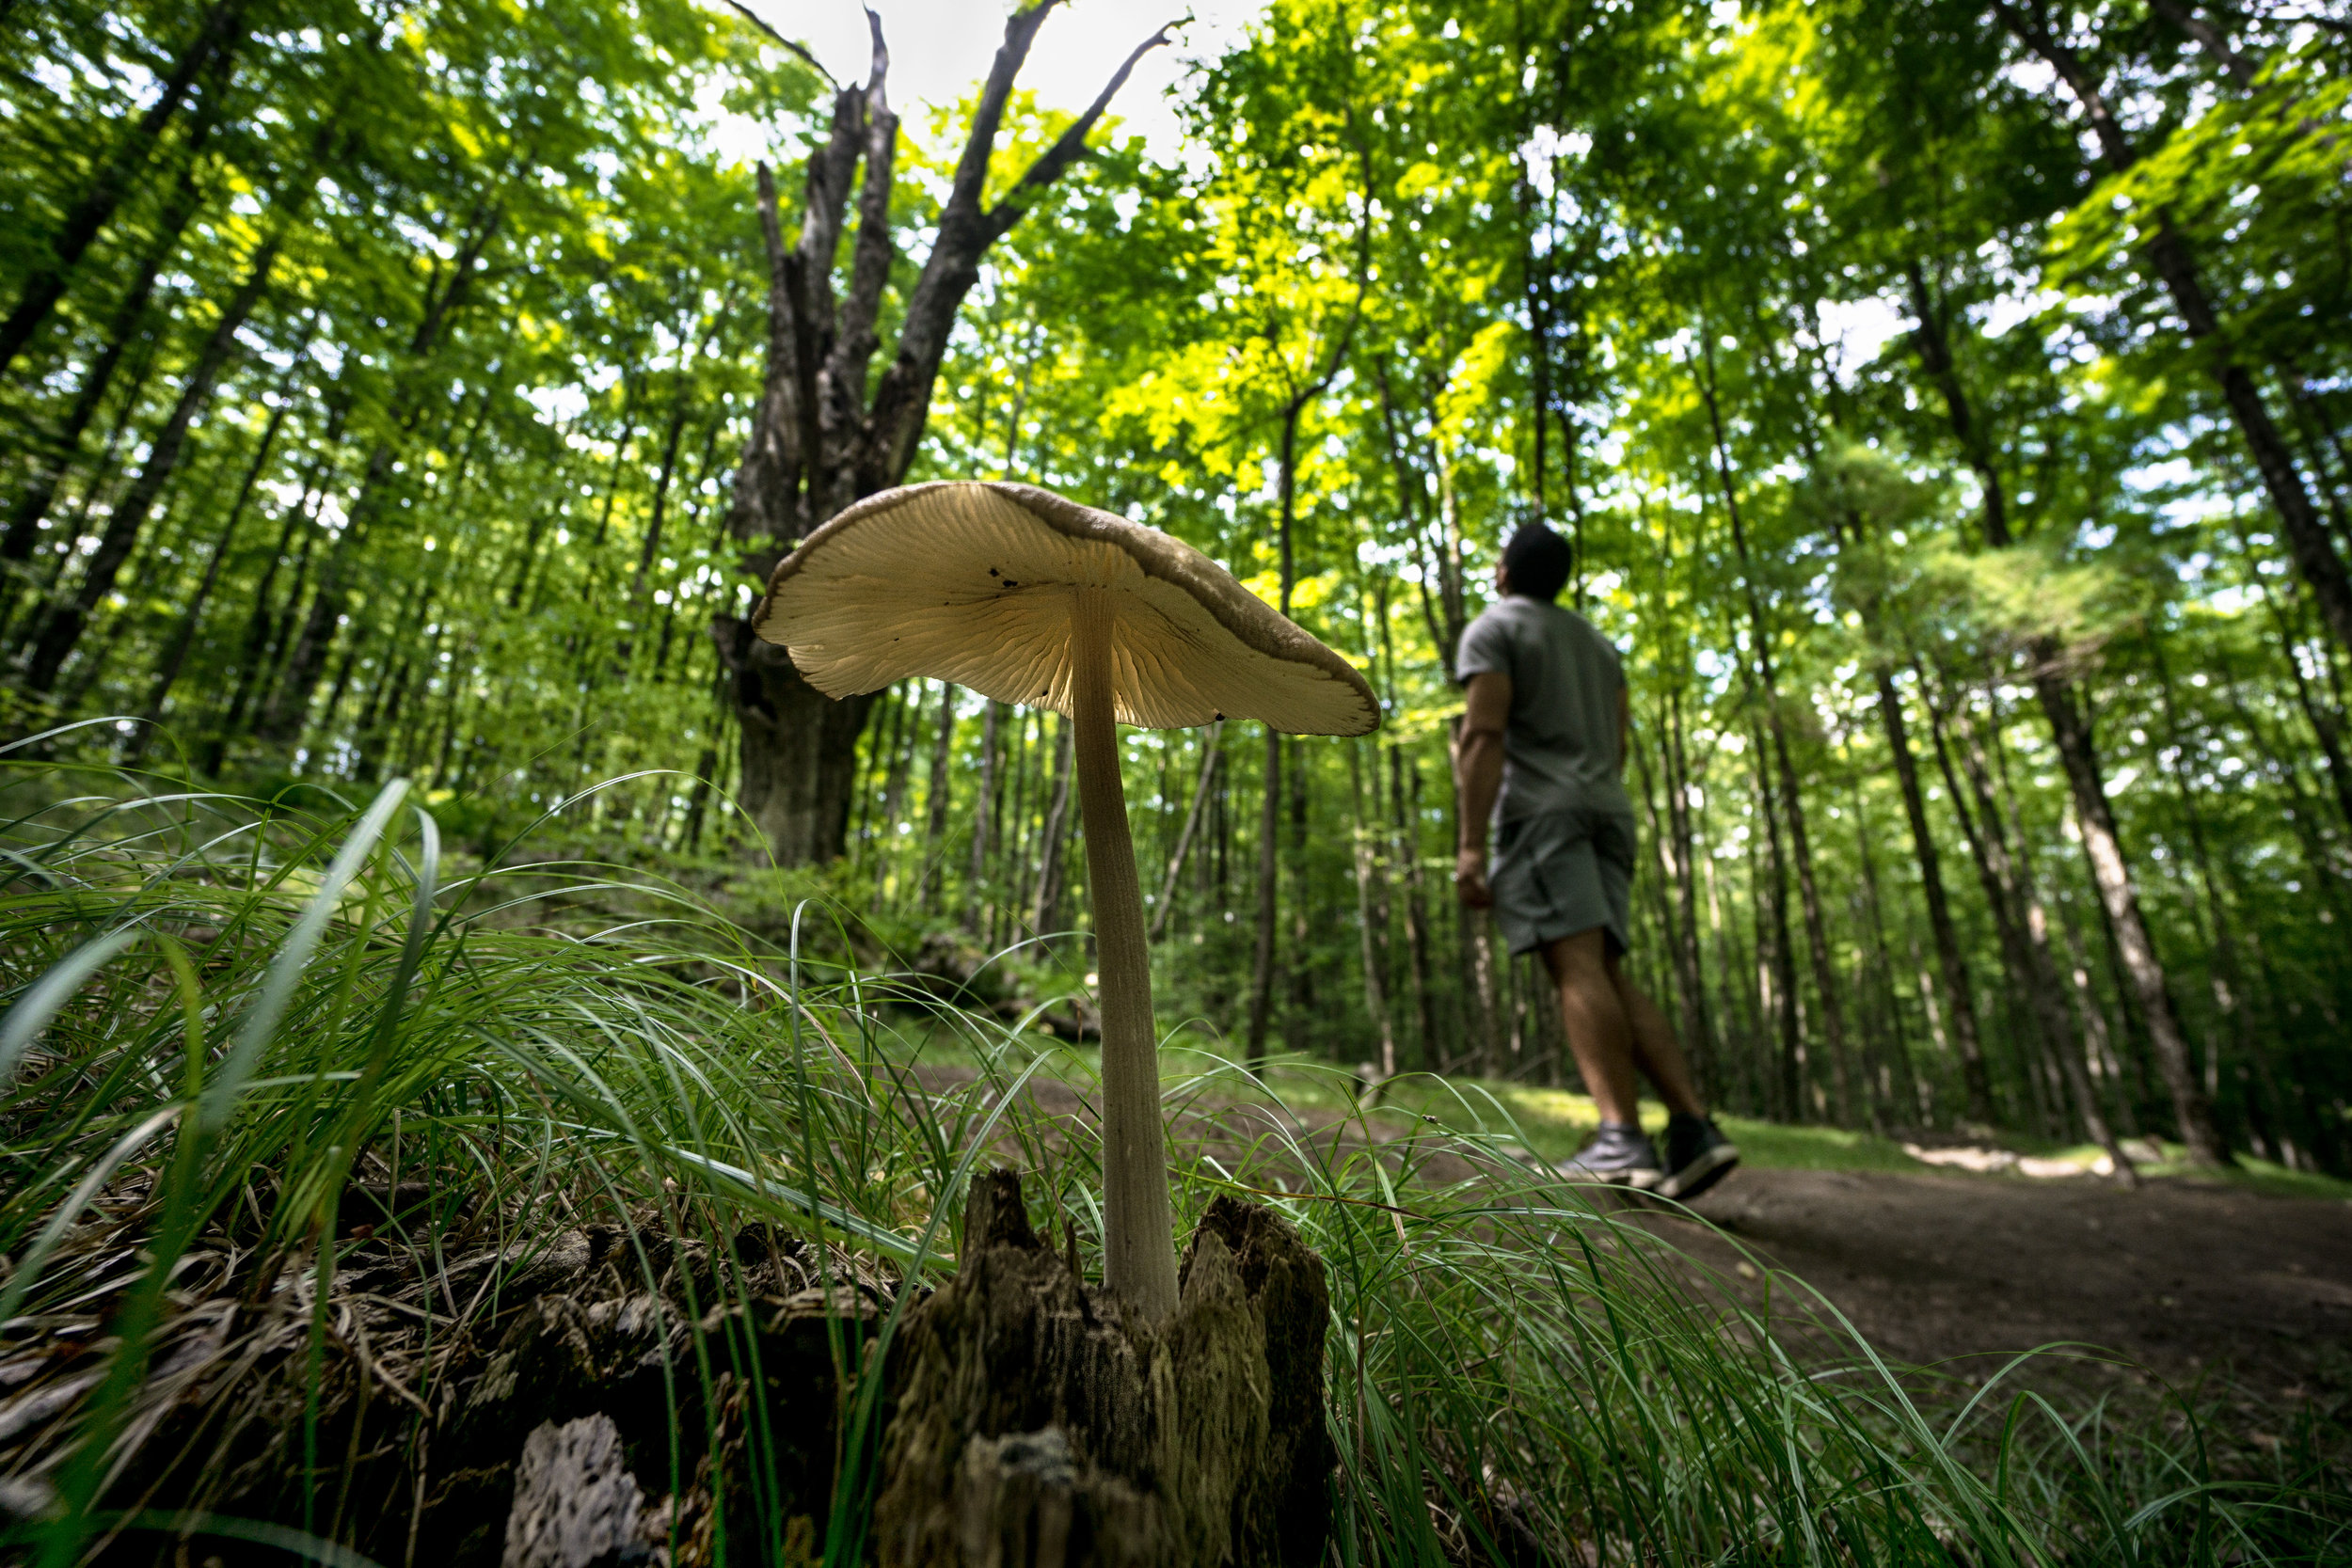 vickygood_photography_nature_mushroom1.jpg